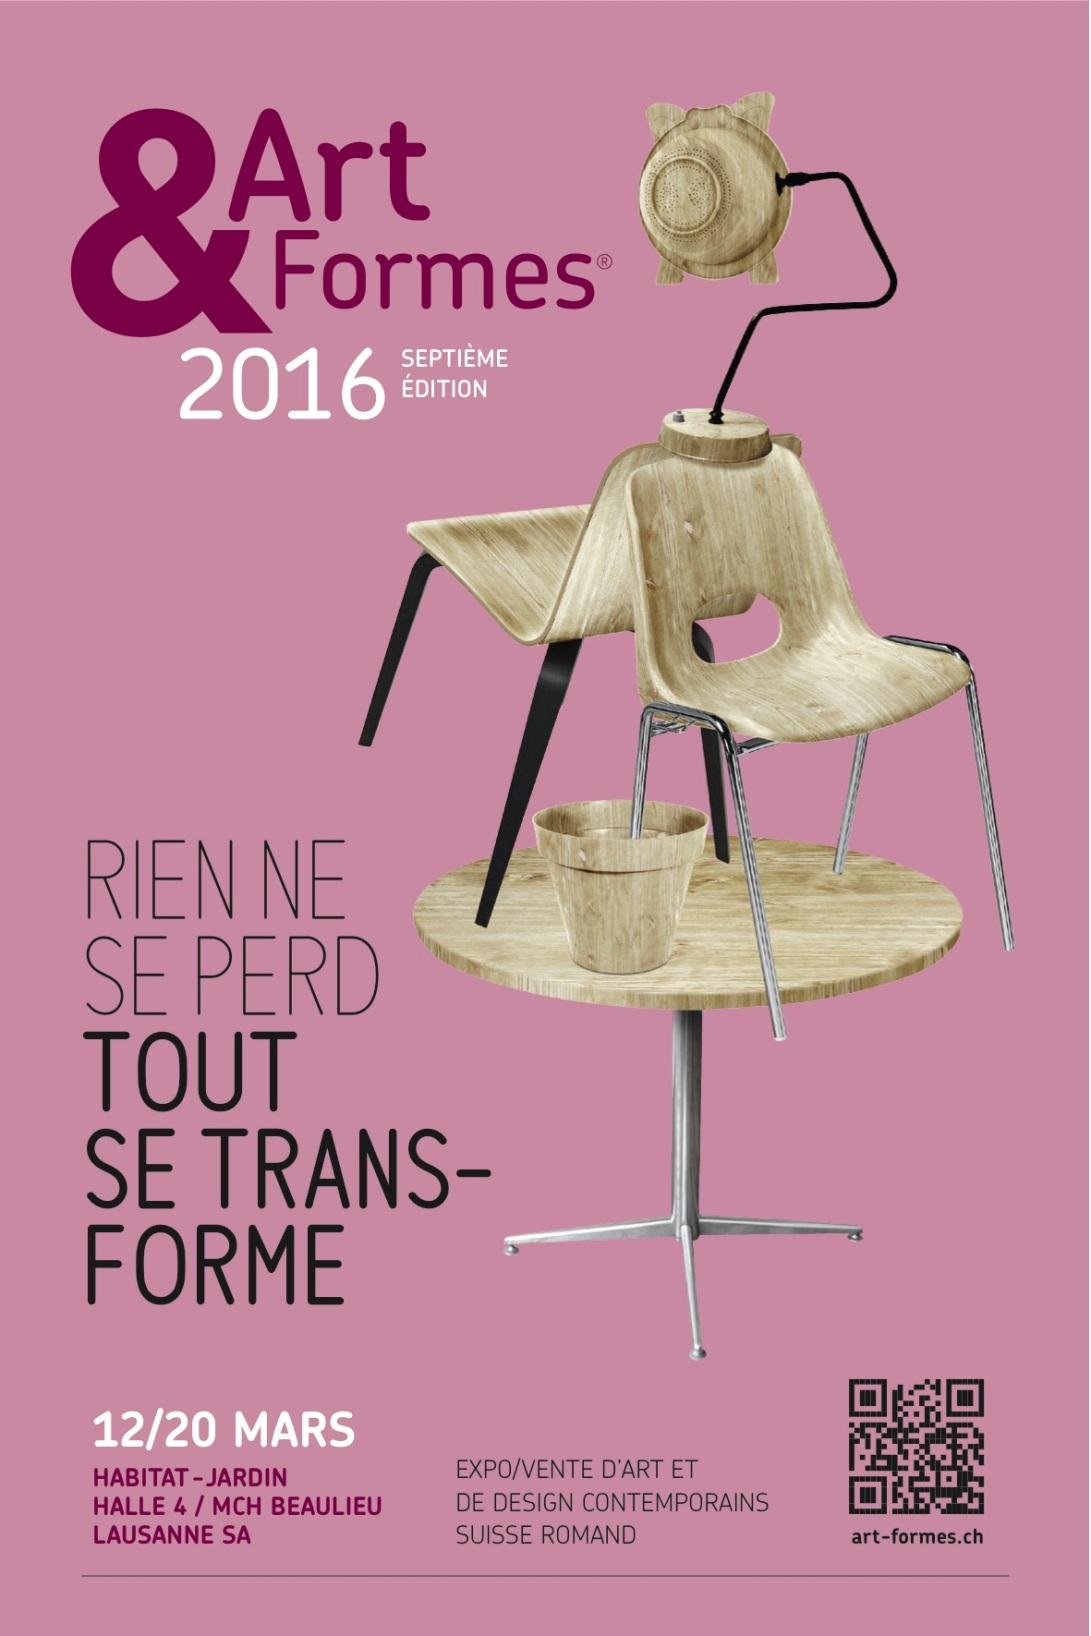 ART&FORMES_2016 copy